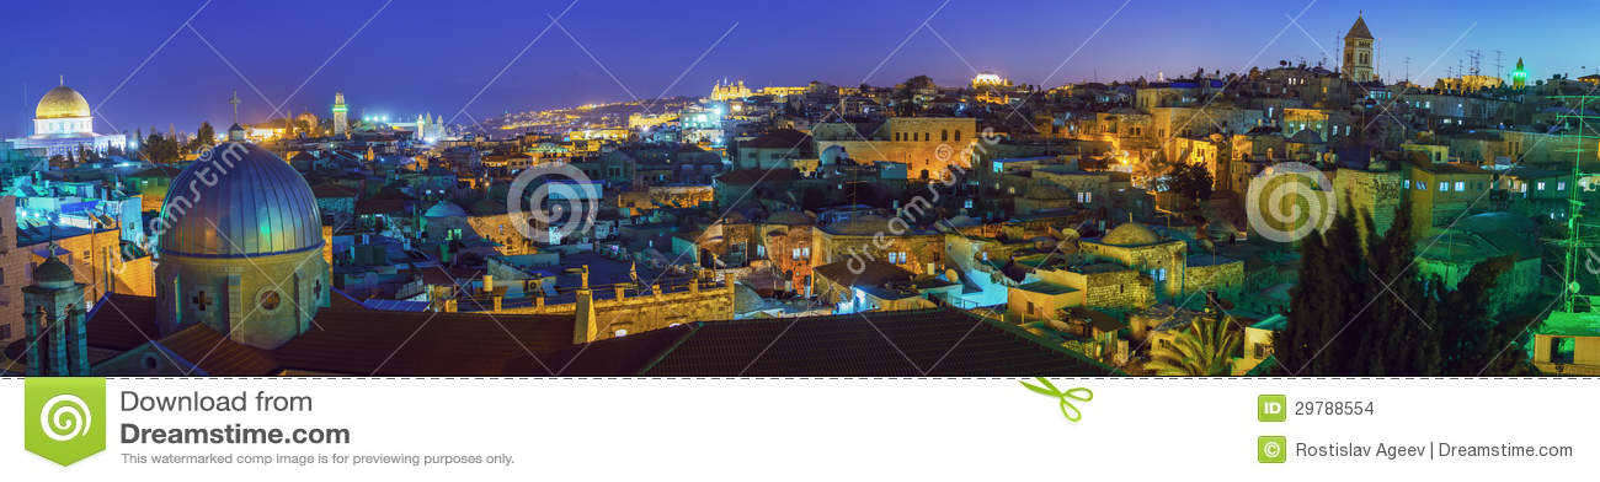 Panorama - Old City at Night, Jerusalem